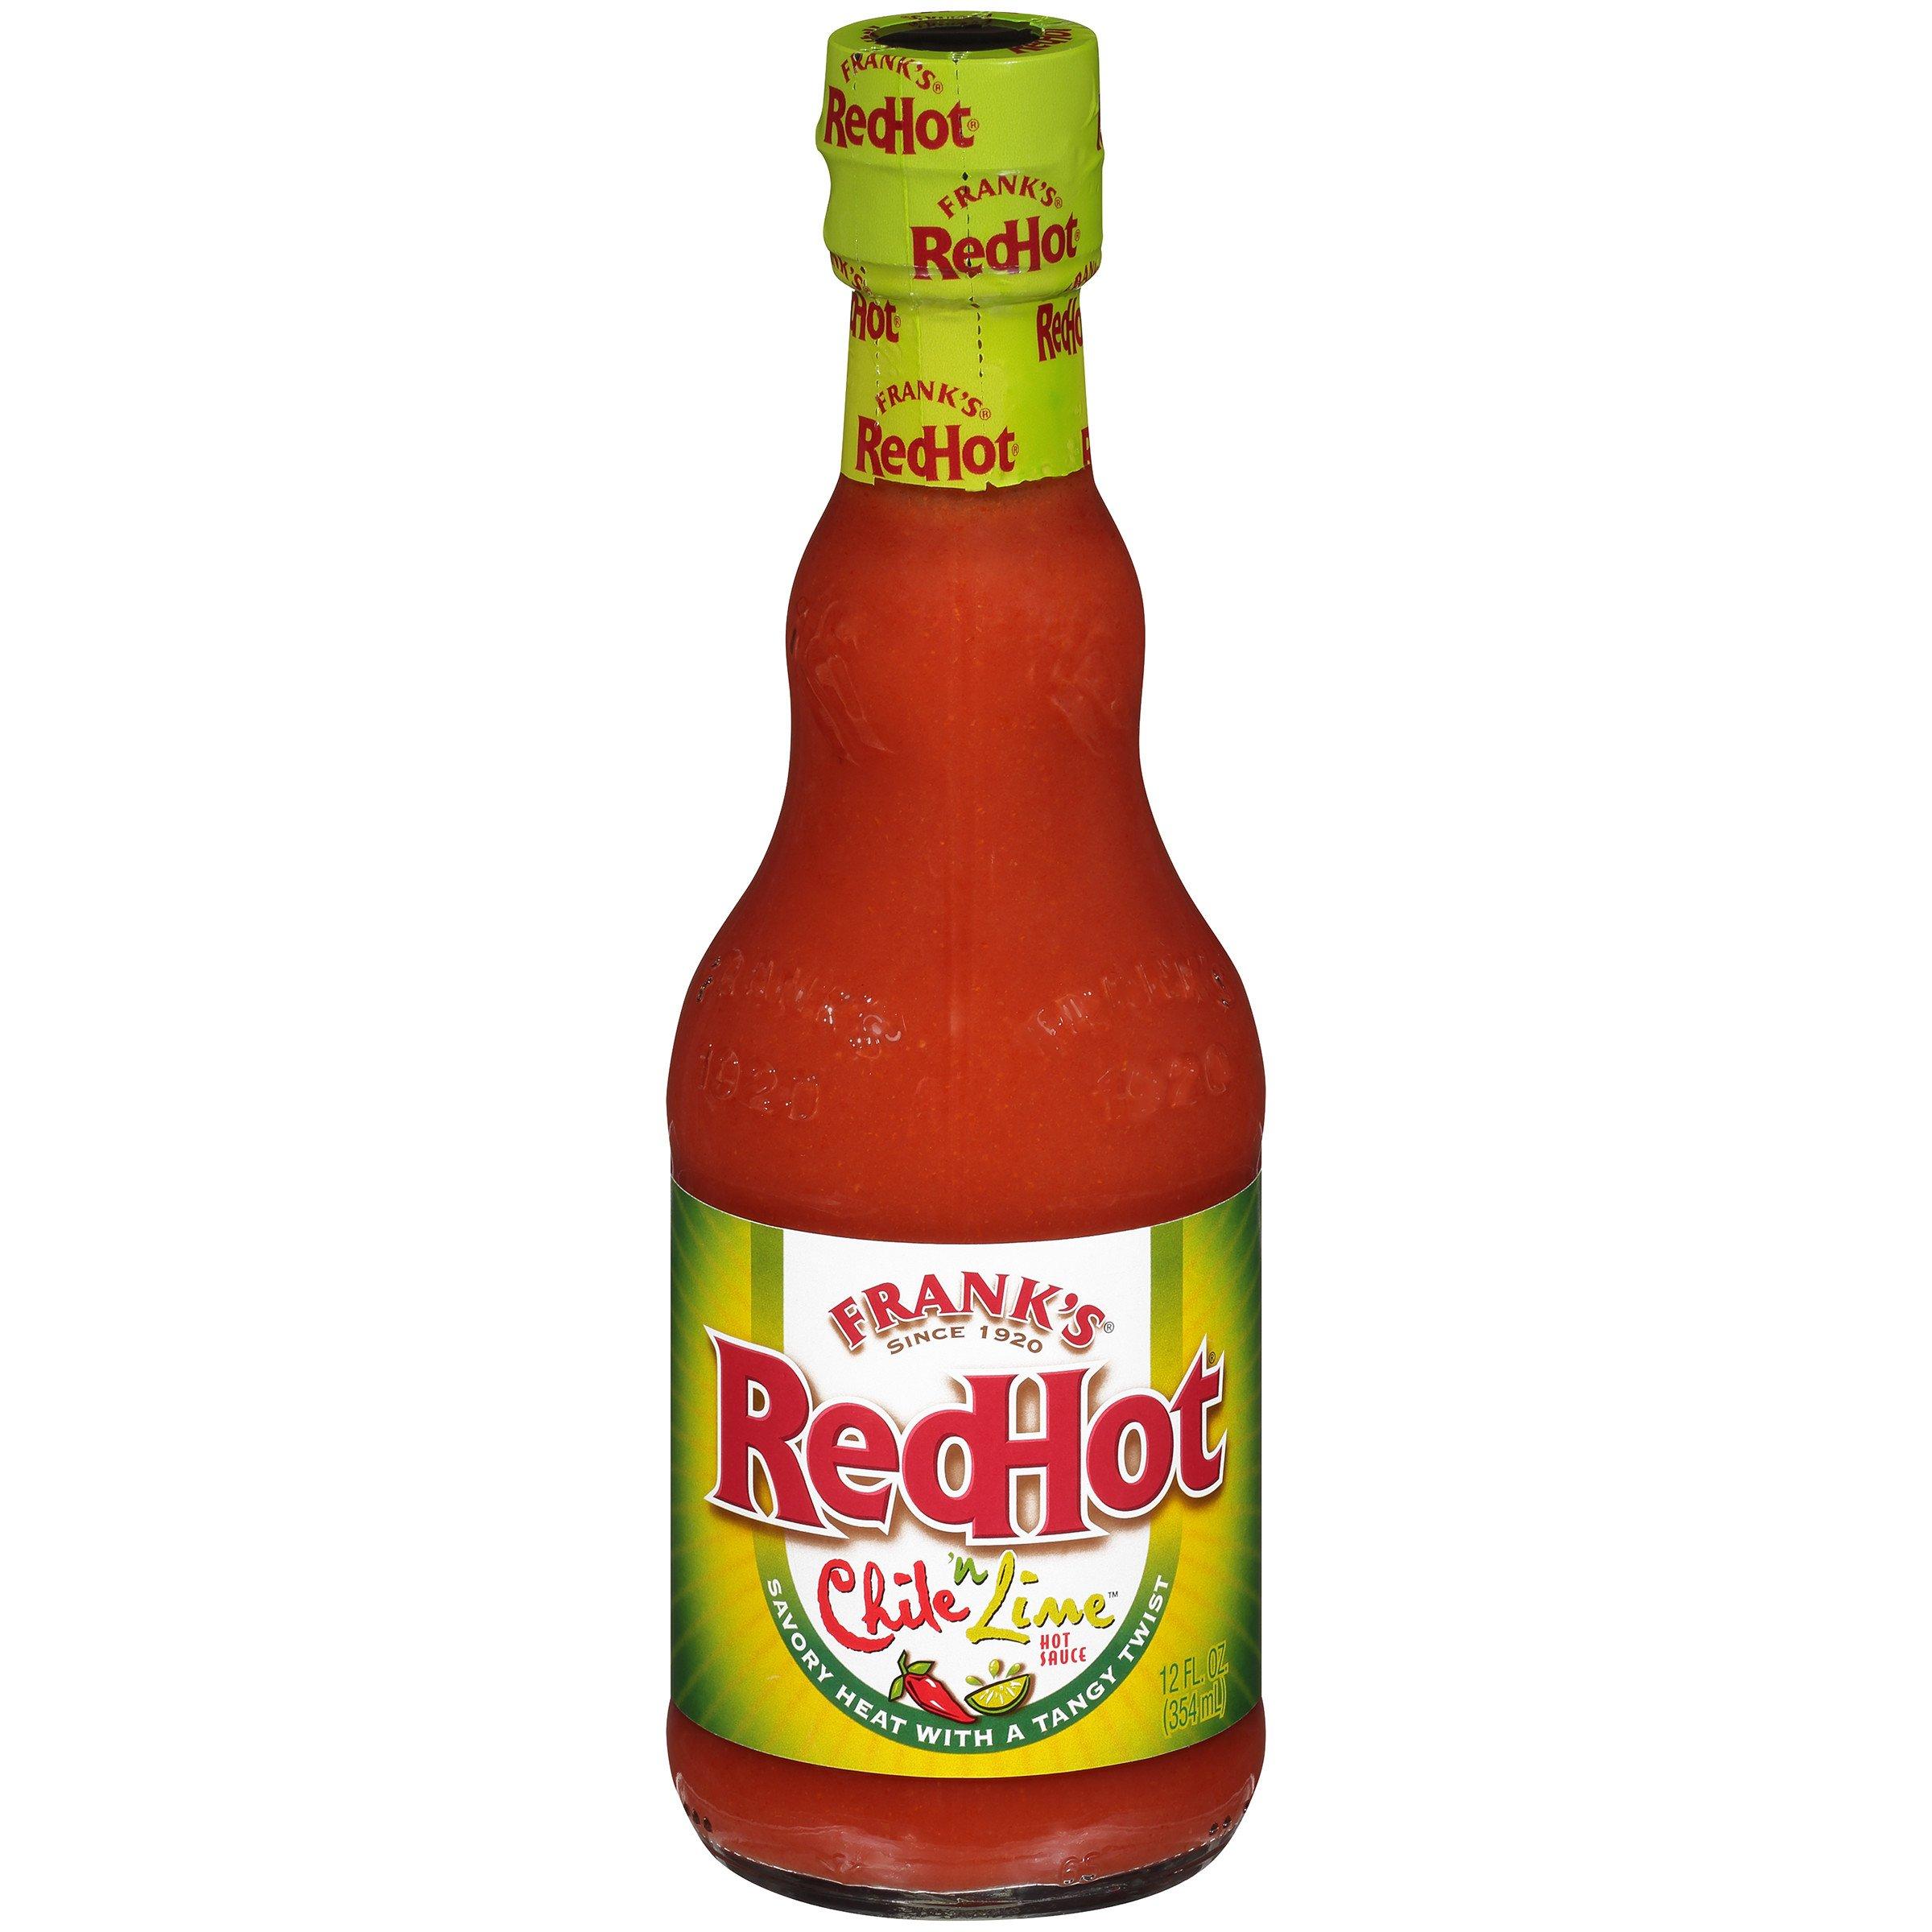 Frank's RedHot Chili 'n Lime Hot Sauce (Keto Friendly), 12 fl oz